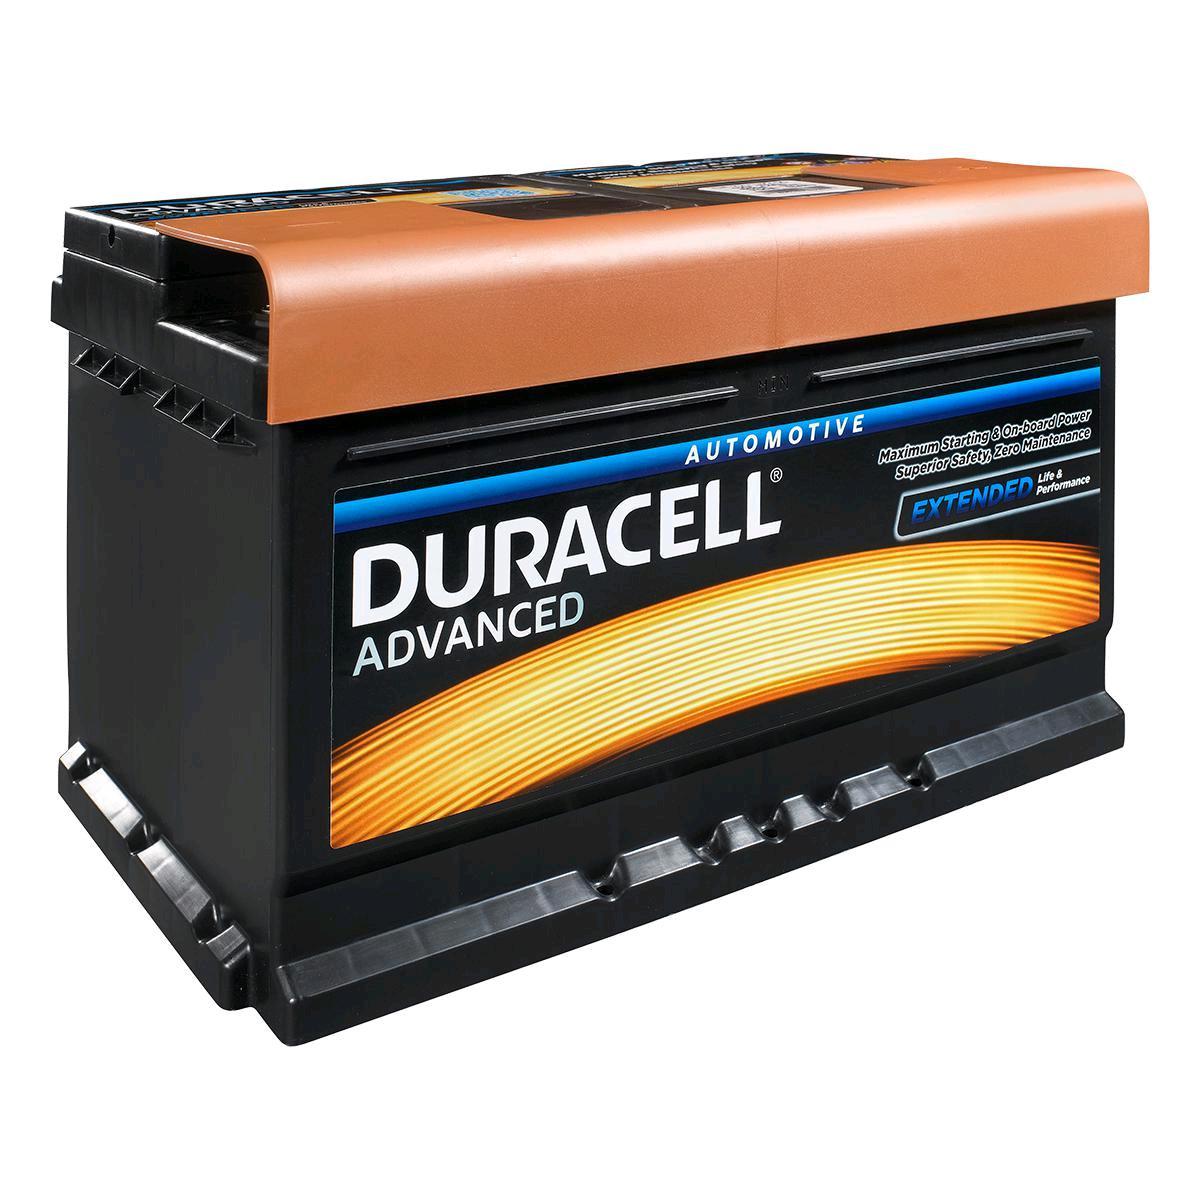 Duracell Battery 12V 80Ah 750A Silver High